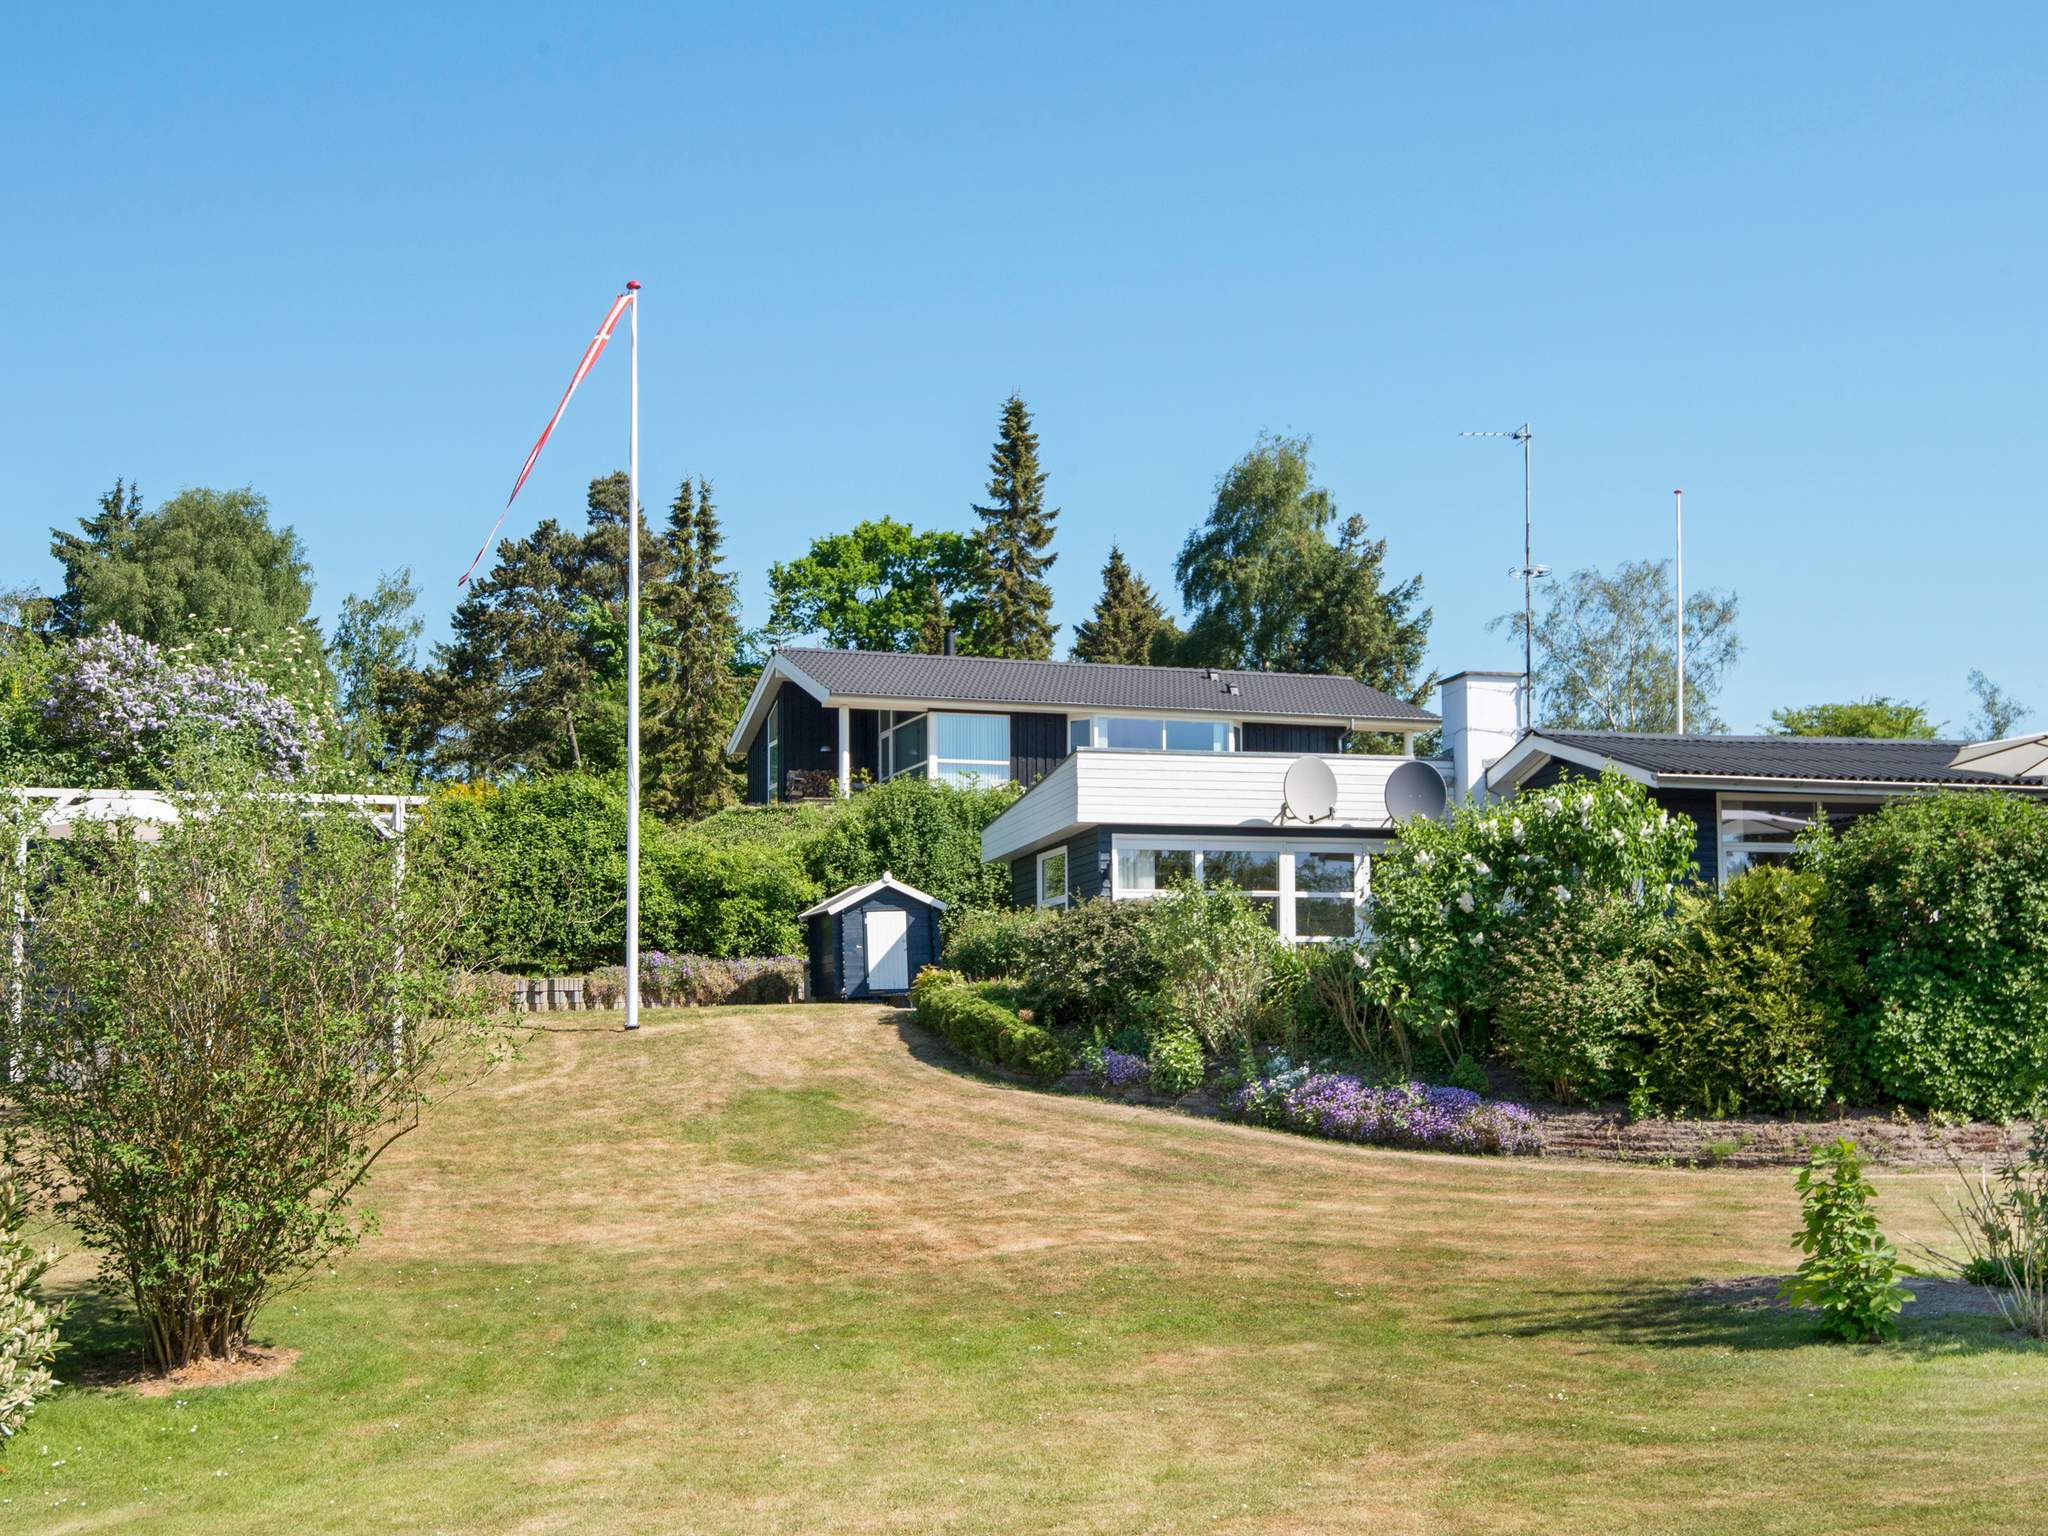 Ferienhaus Lyngsbæk Strand (493402), Ebeltoft, , Ostjütland, Dänemark, Bild 17